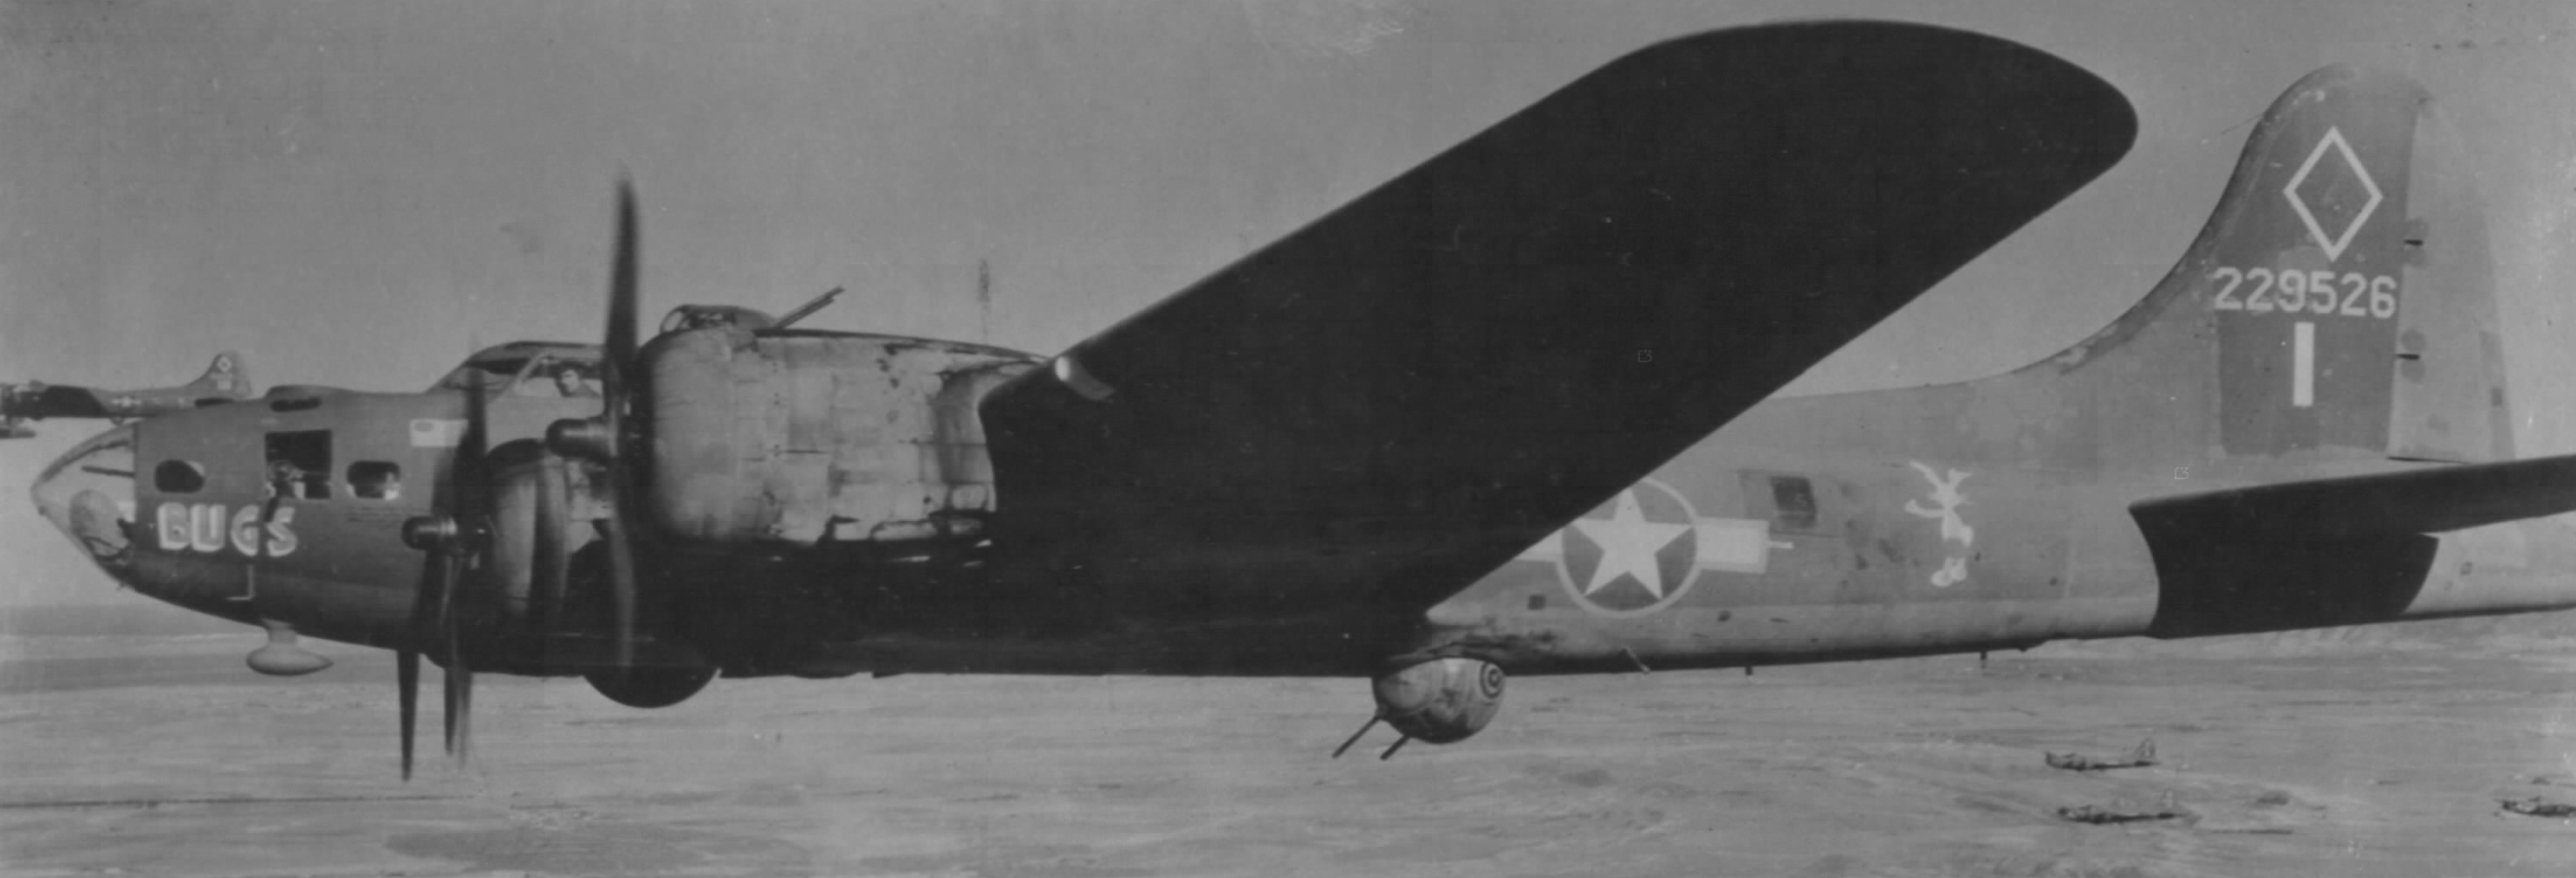 B-17 #42-29526 / Bugs